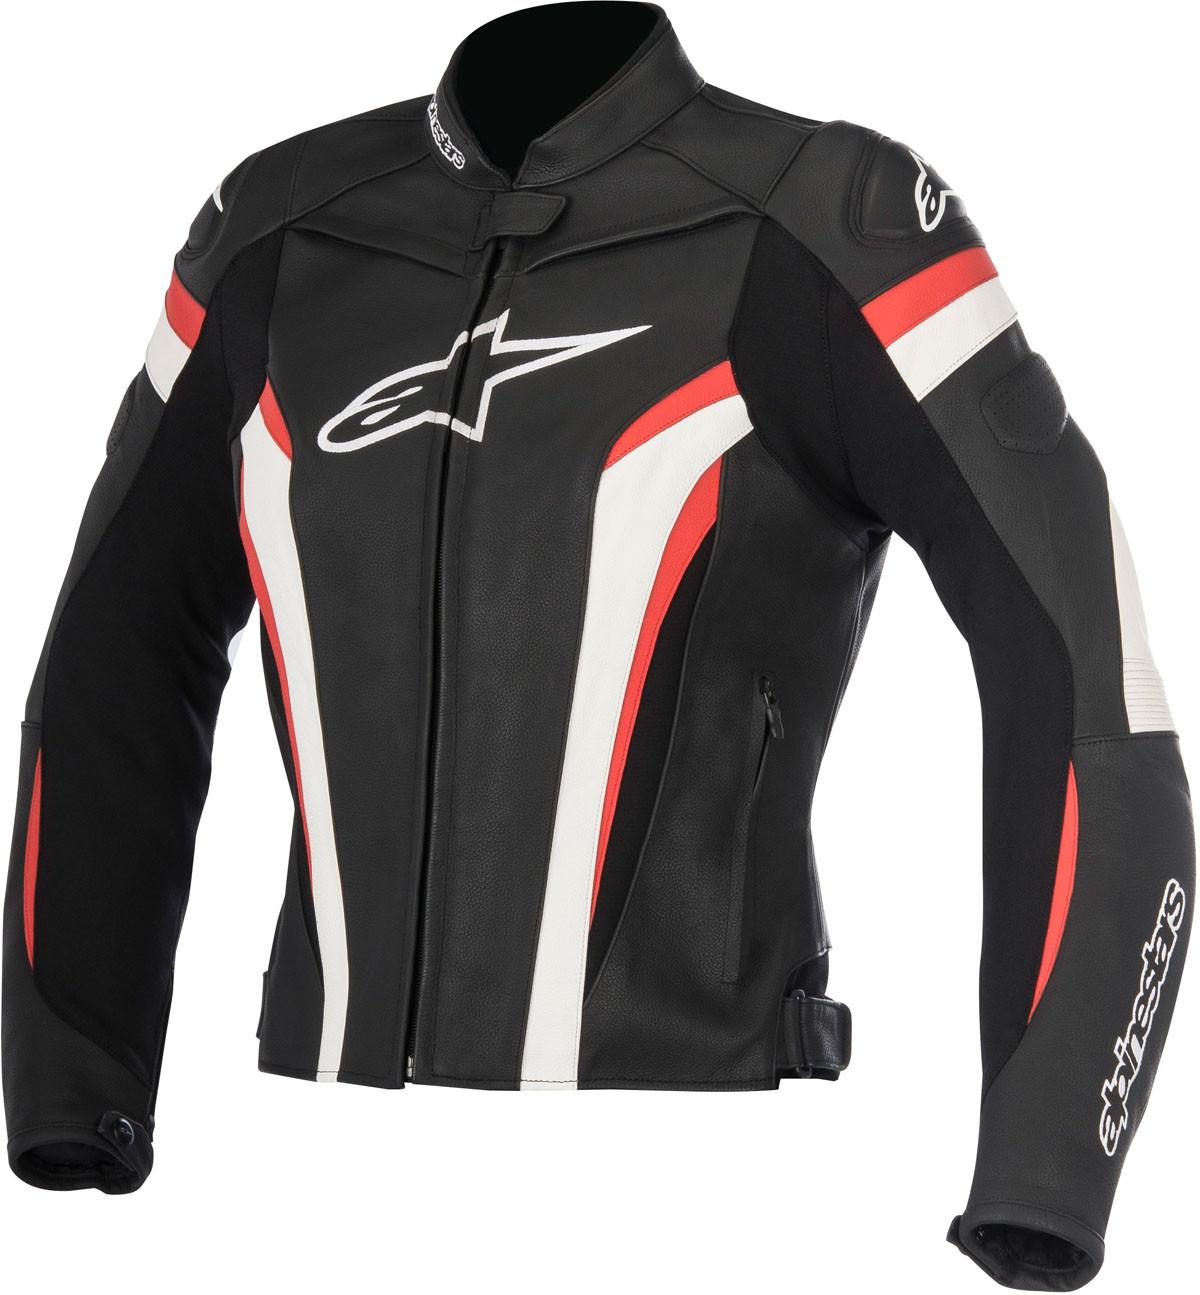 93f2032ae2c51b Giacca moto pelle donna Alpinestars STELLA GP PLUS R V2 nero bianco rosso